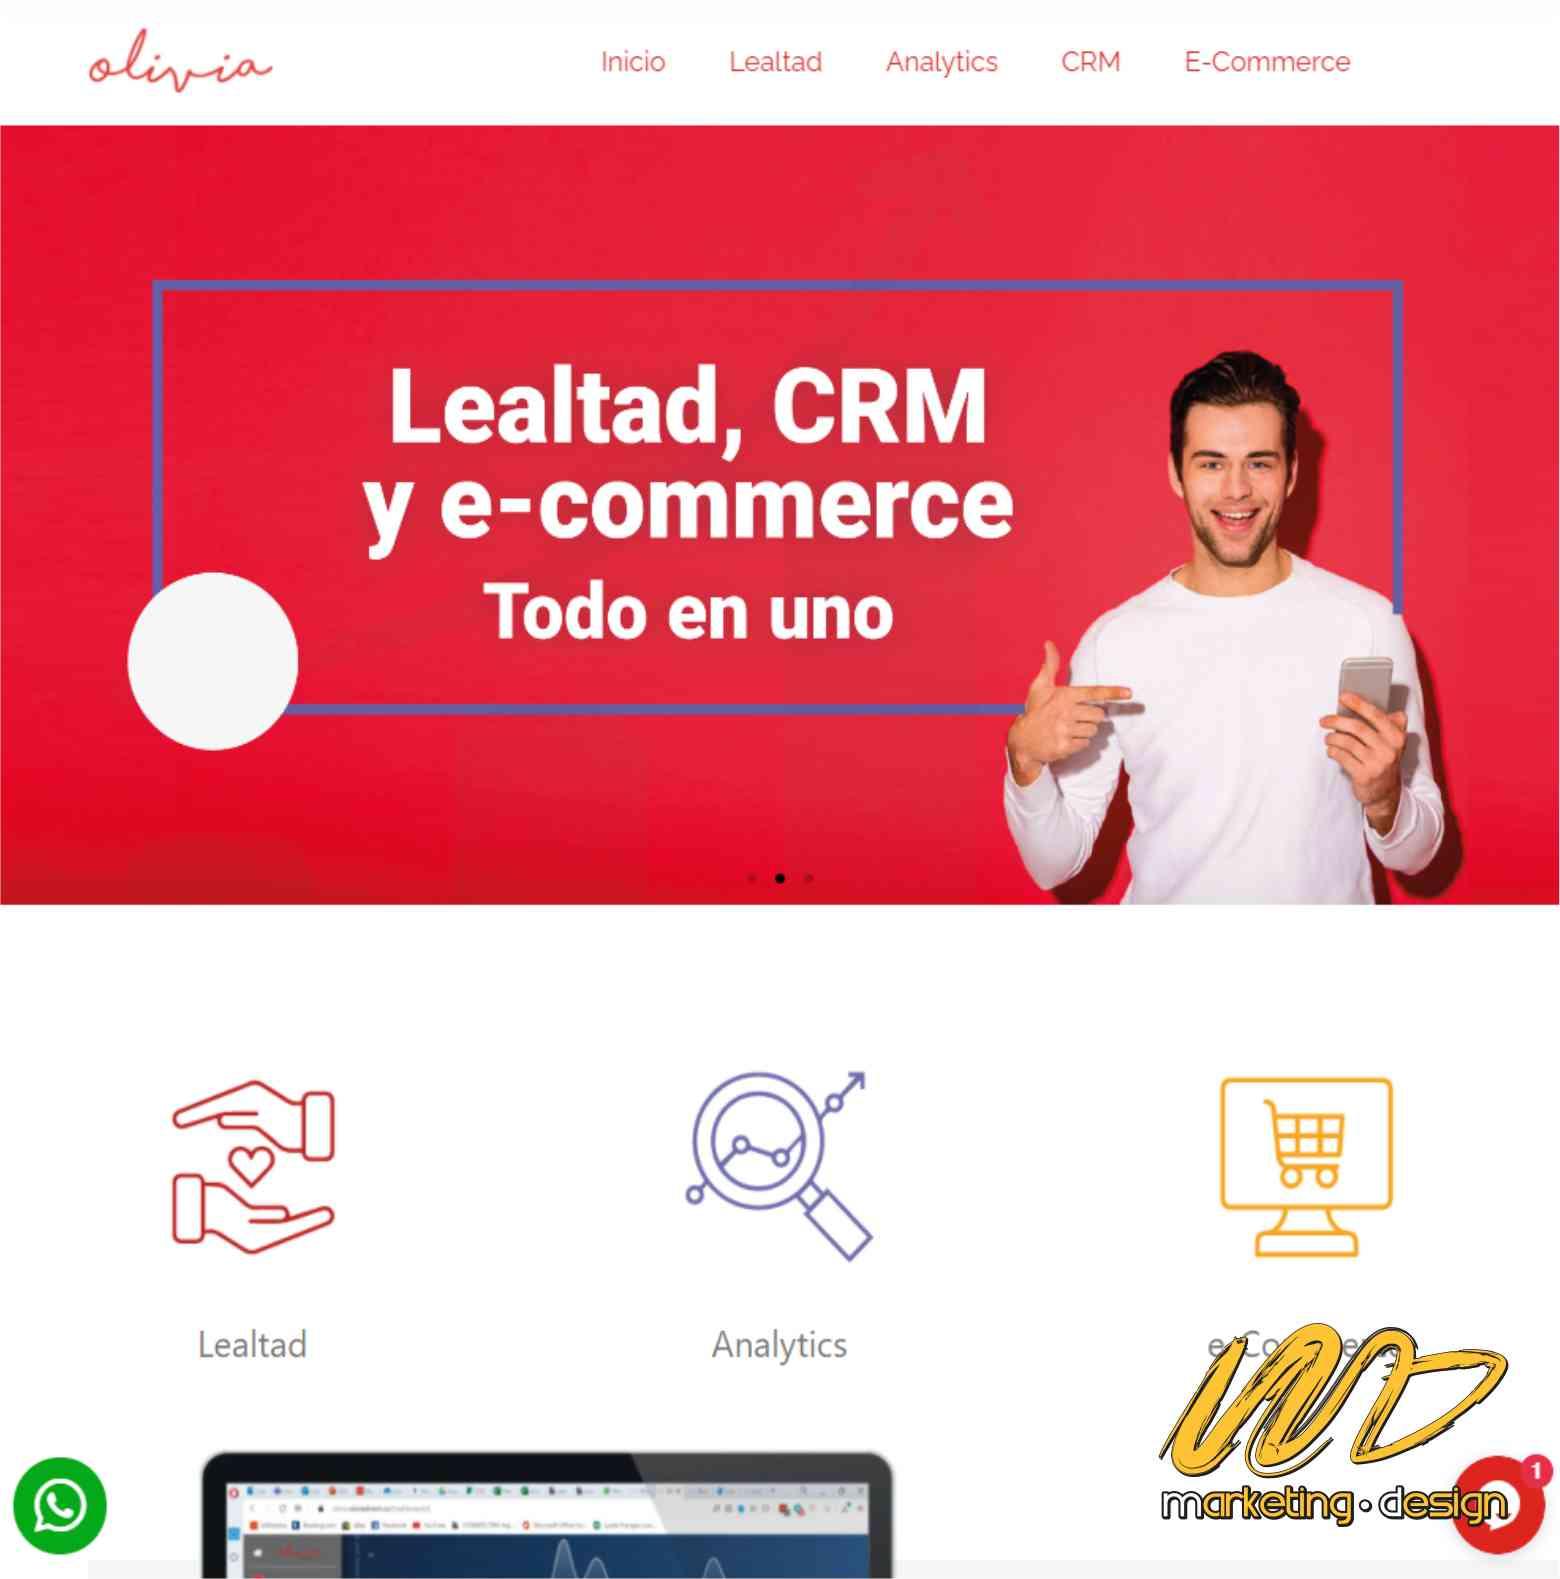 Sitios Web Marketing Design 2006